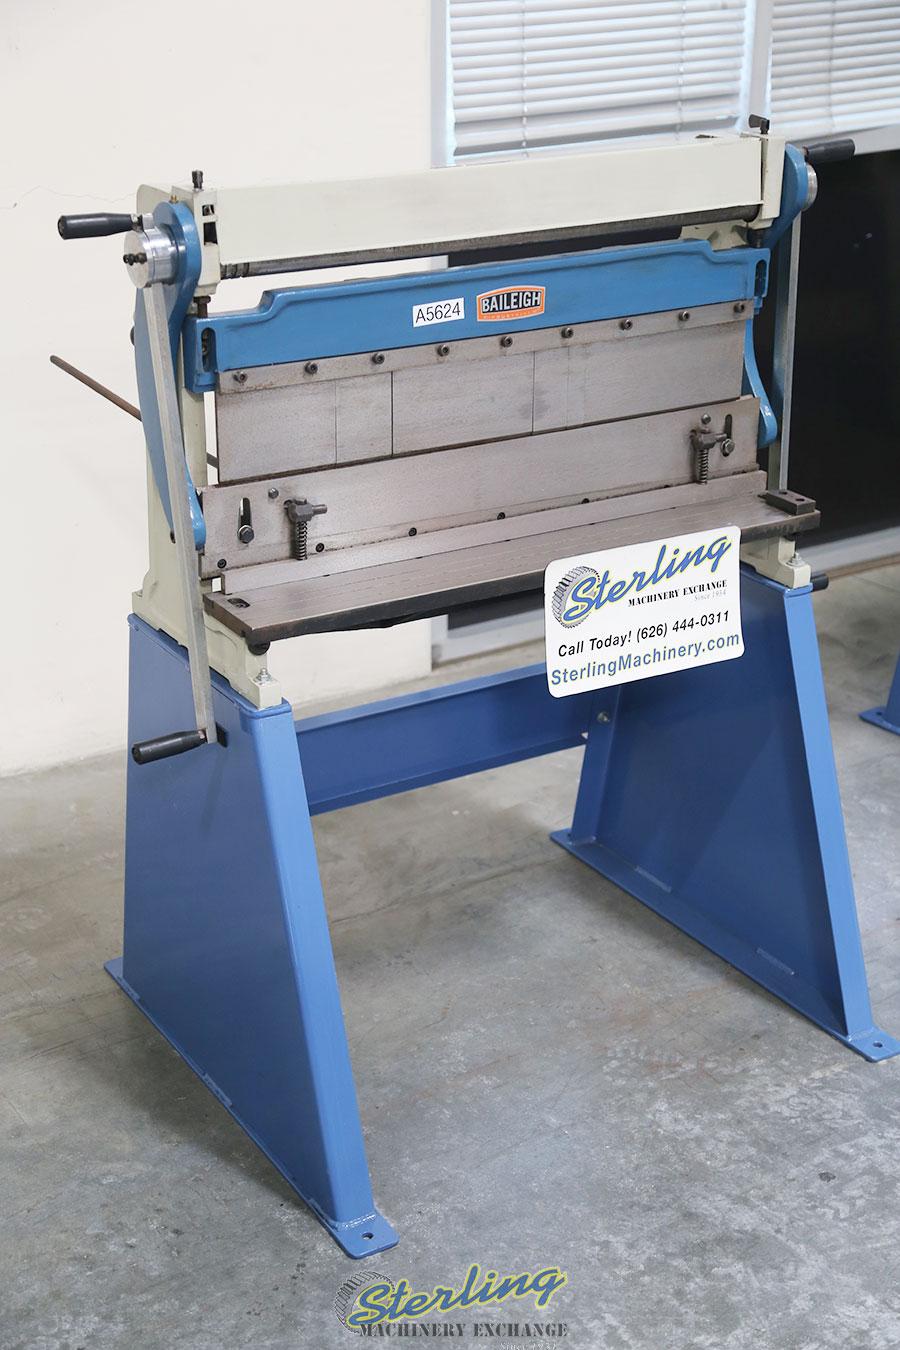 52 3-in-1 shear brake slip roll machine operation manual